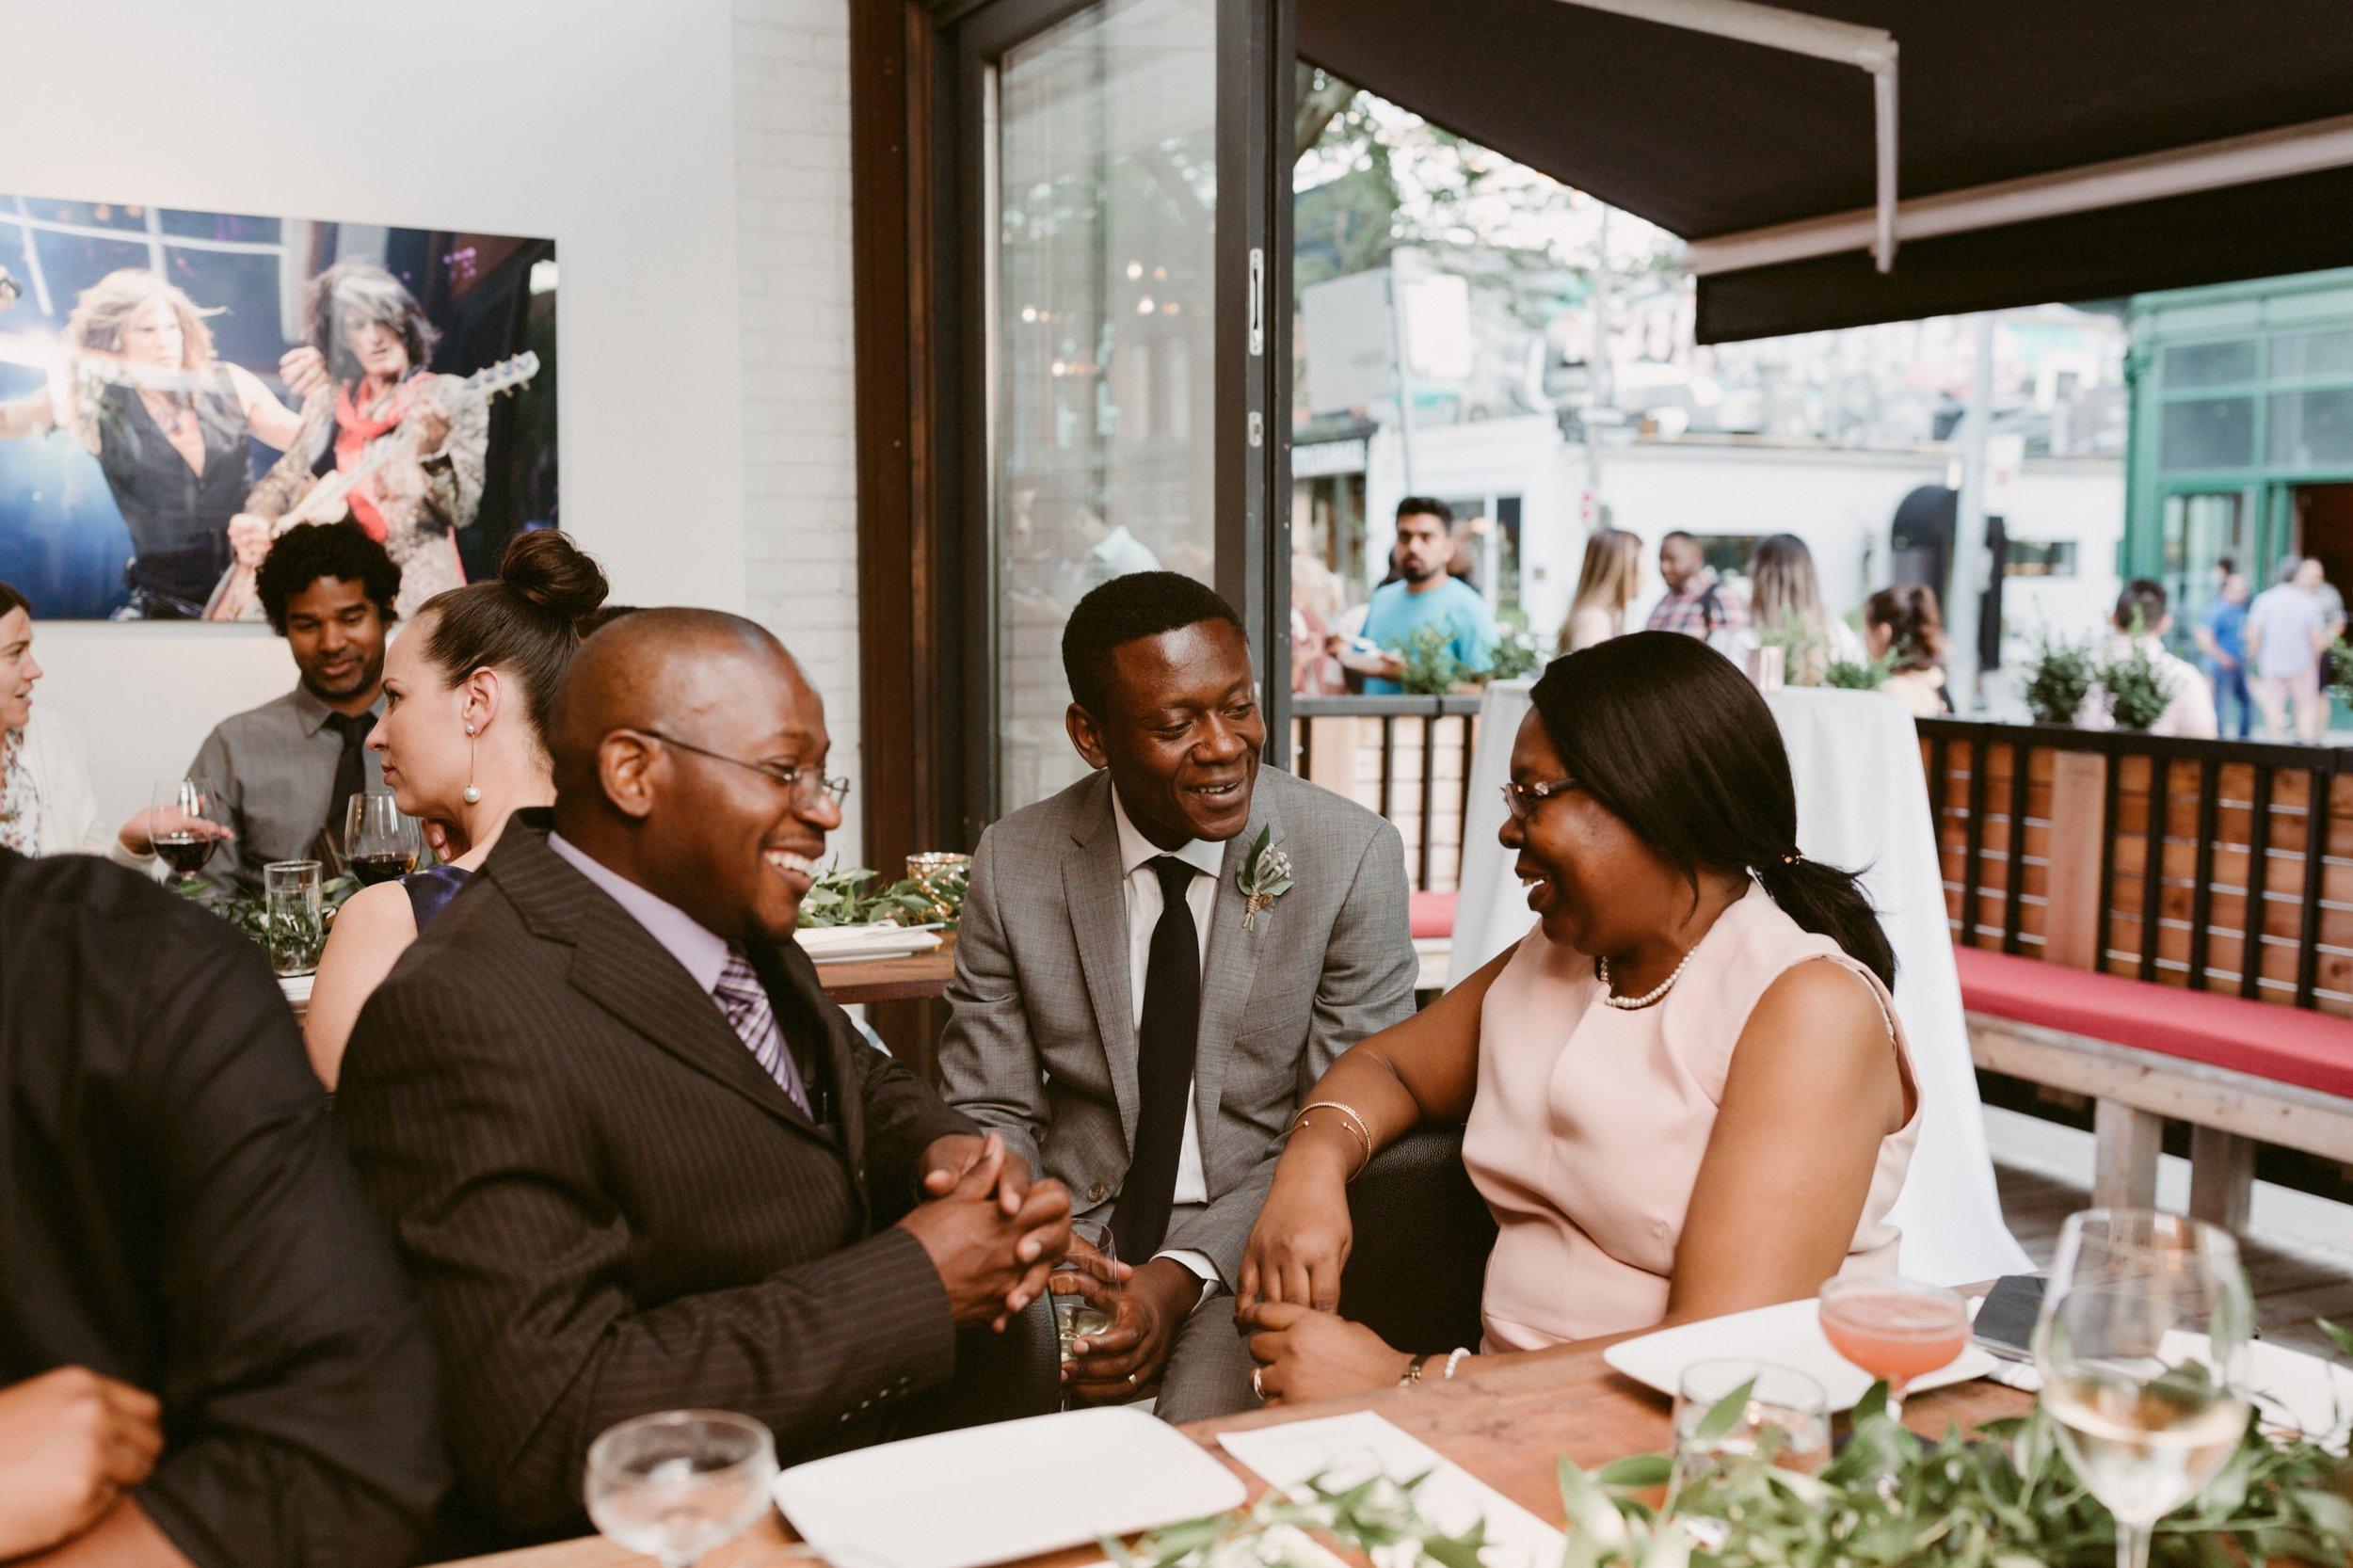 078_Spadina House Wedding (468 of 748)_intimate_Boehmer_Restaurant_Toronto_Wedding.jpg